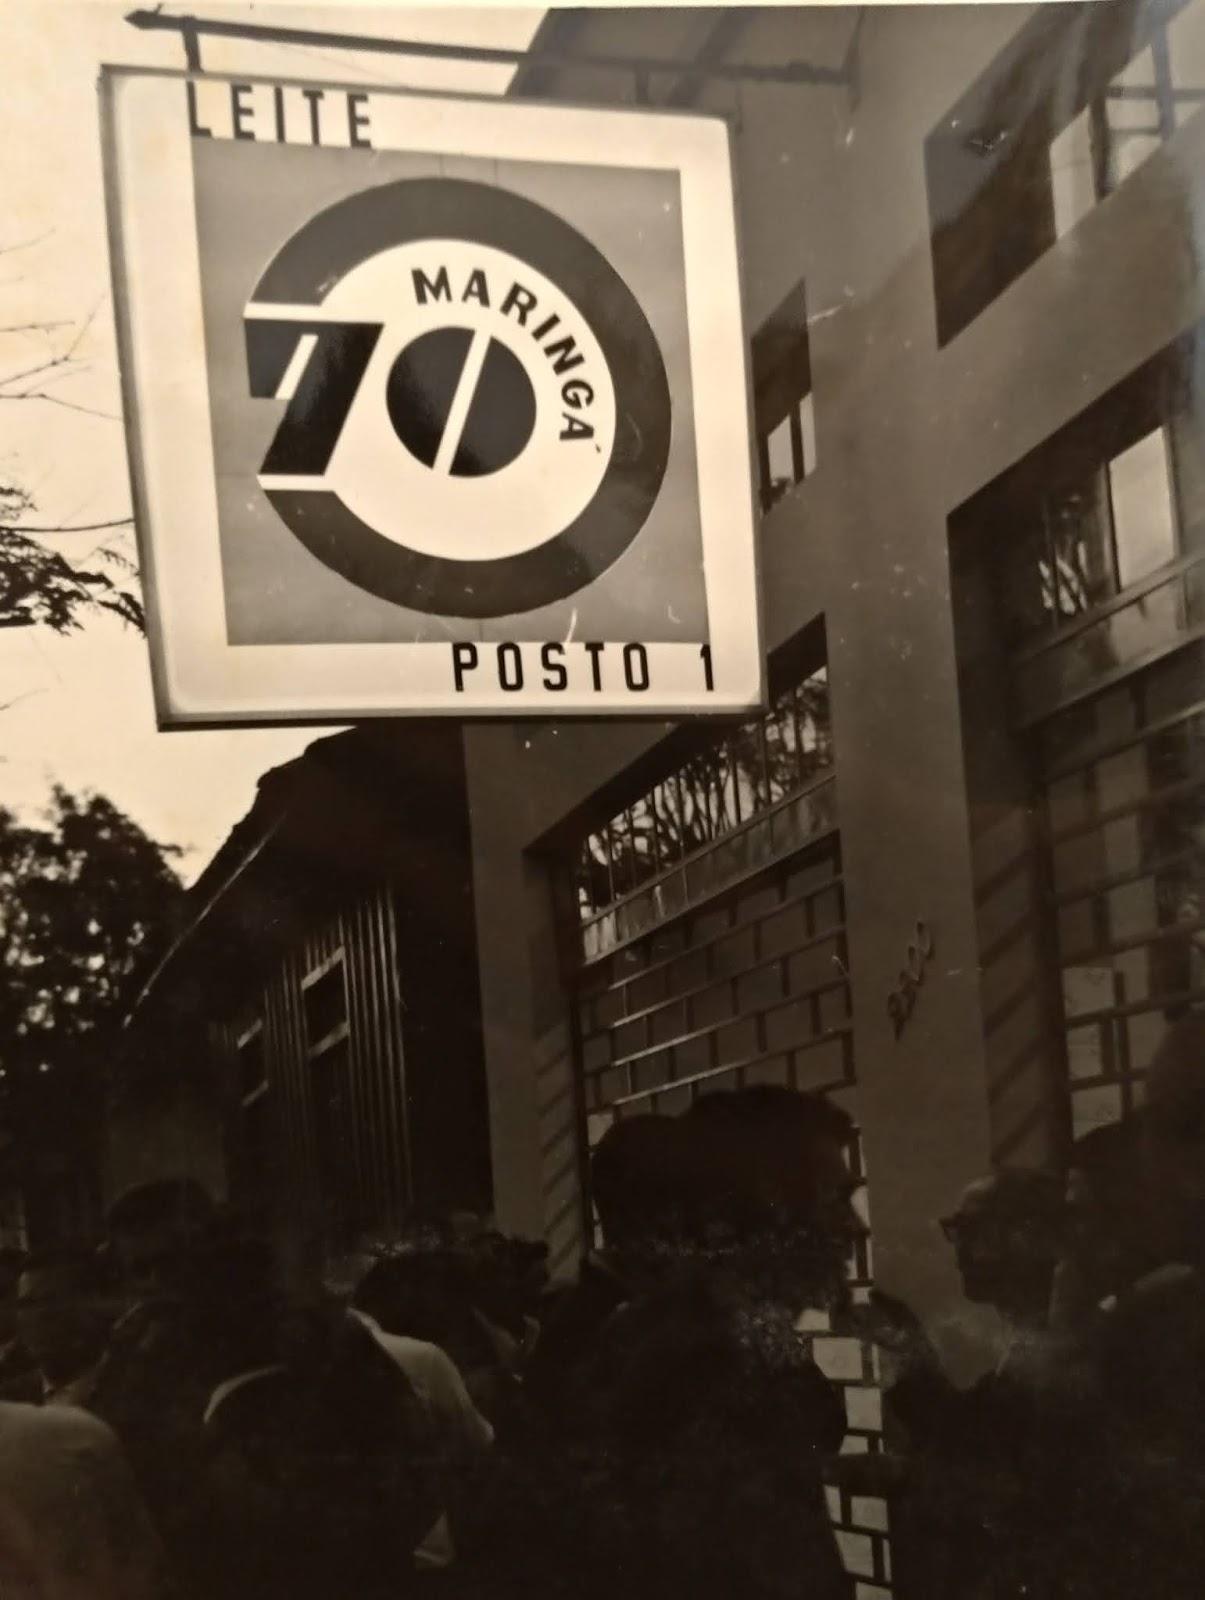 Posto 1 da Maringá 70 - Década de 1970